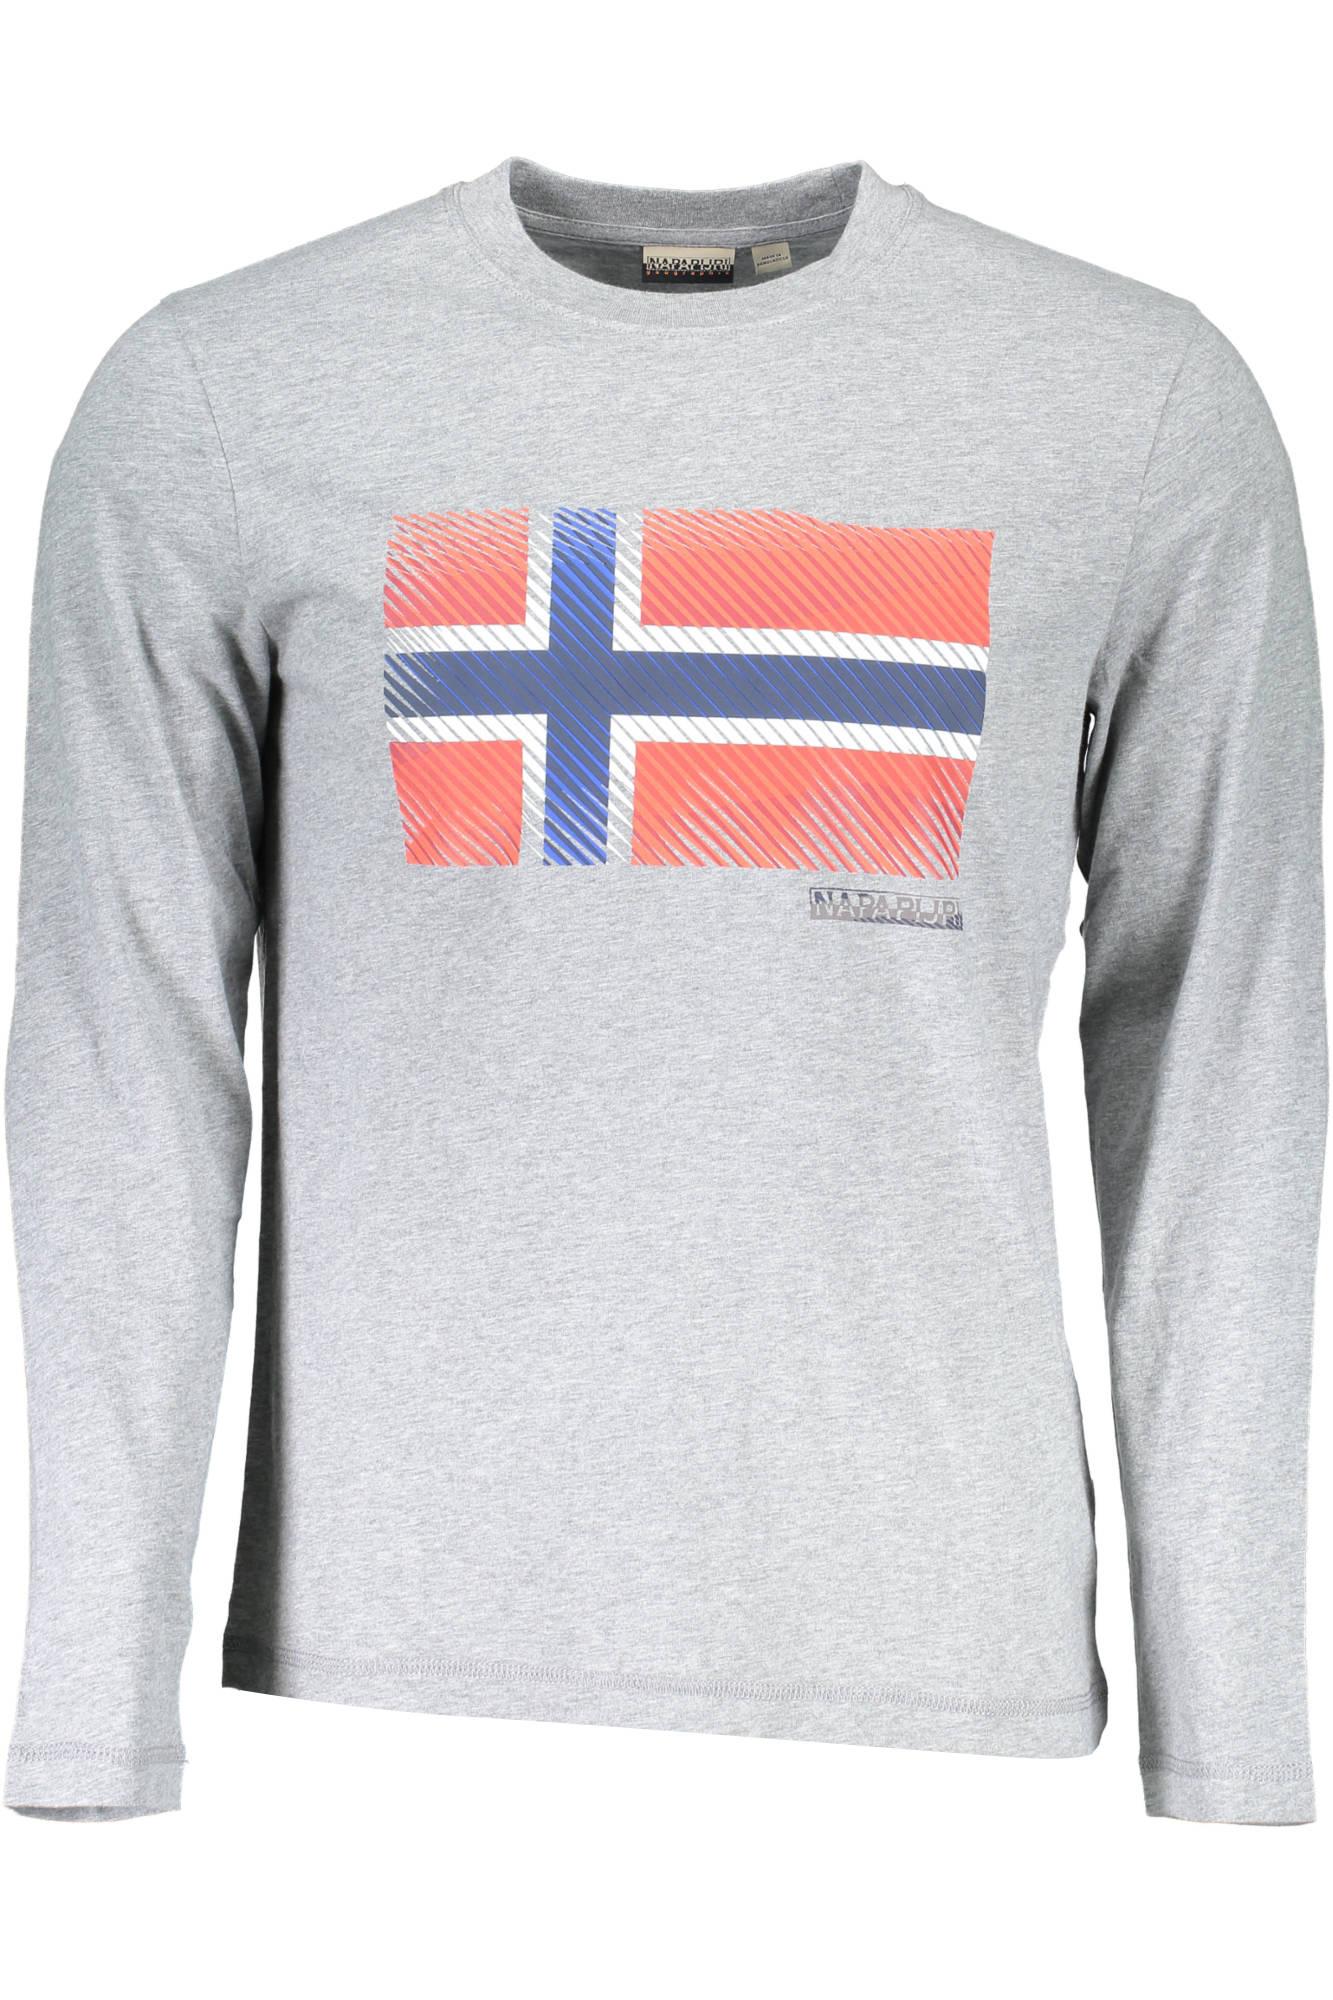 Napapijri N0YIX1 SIBU LS T Shirt mit langen Ärmeln Mann